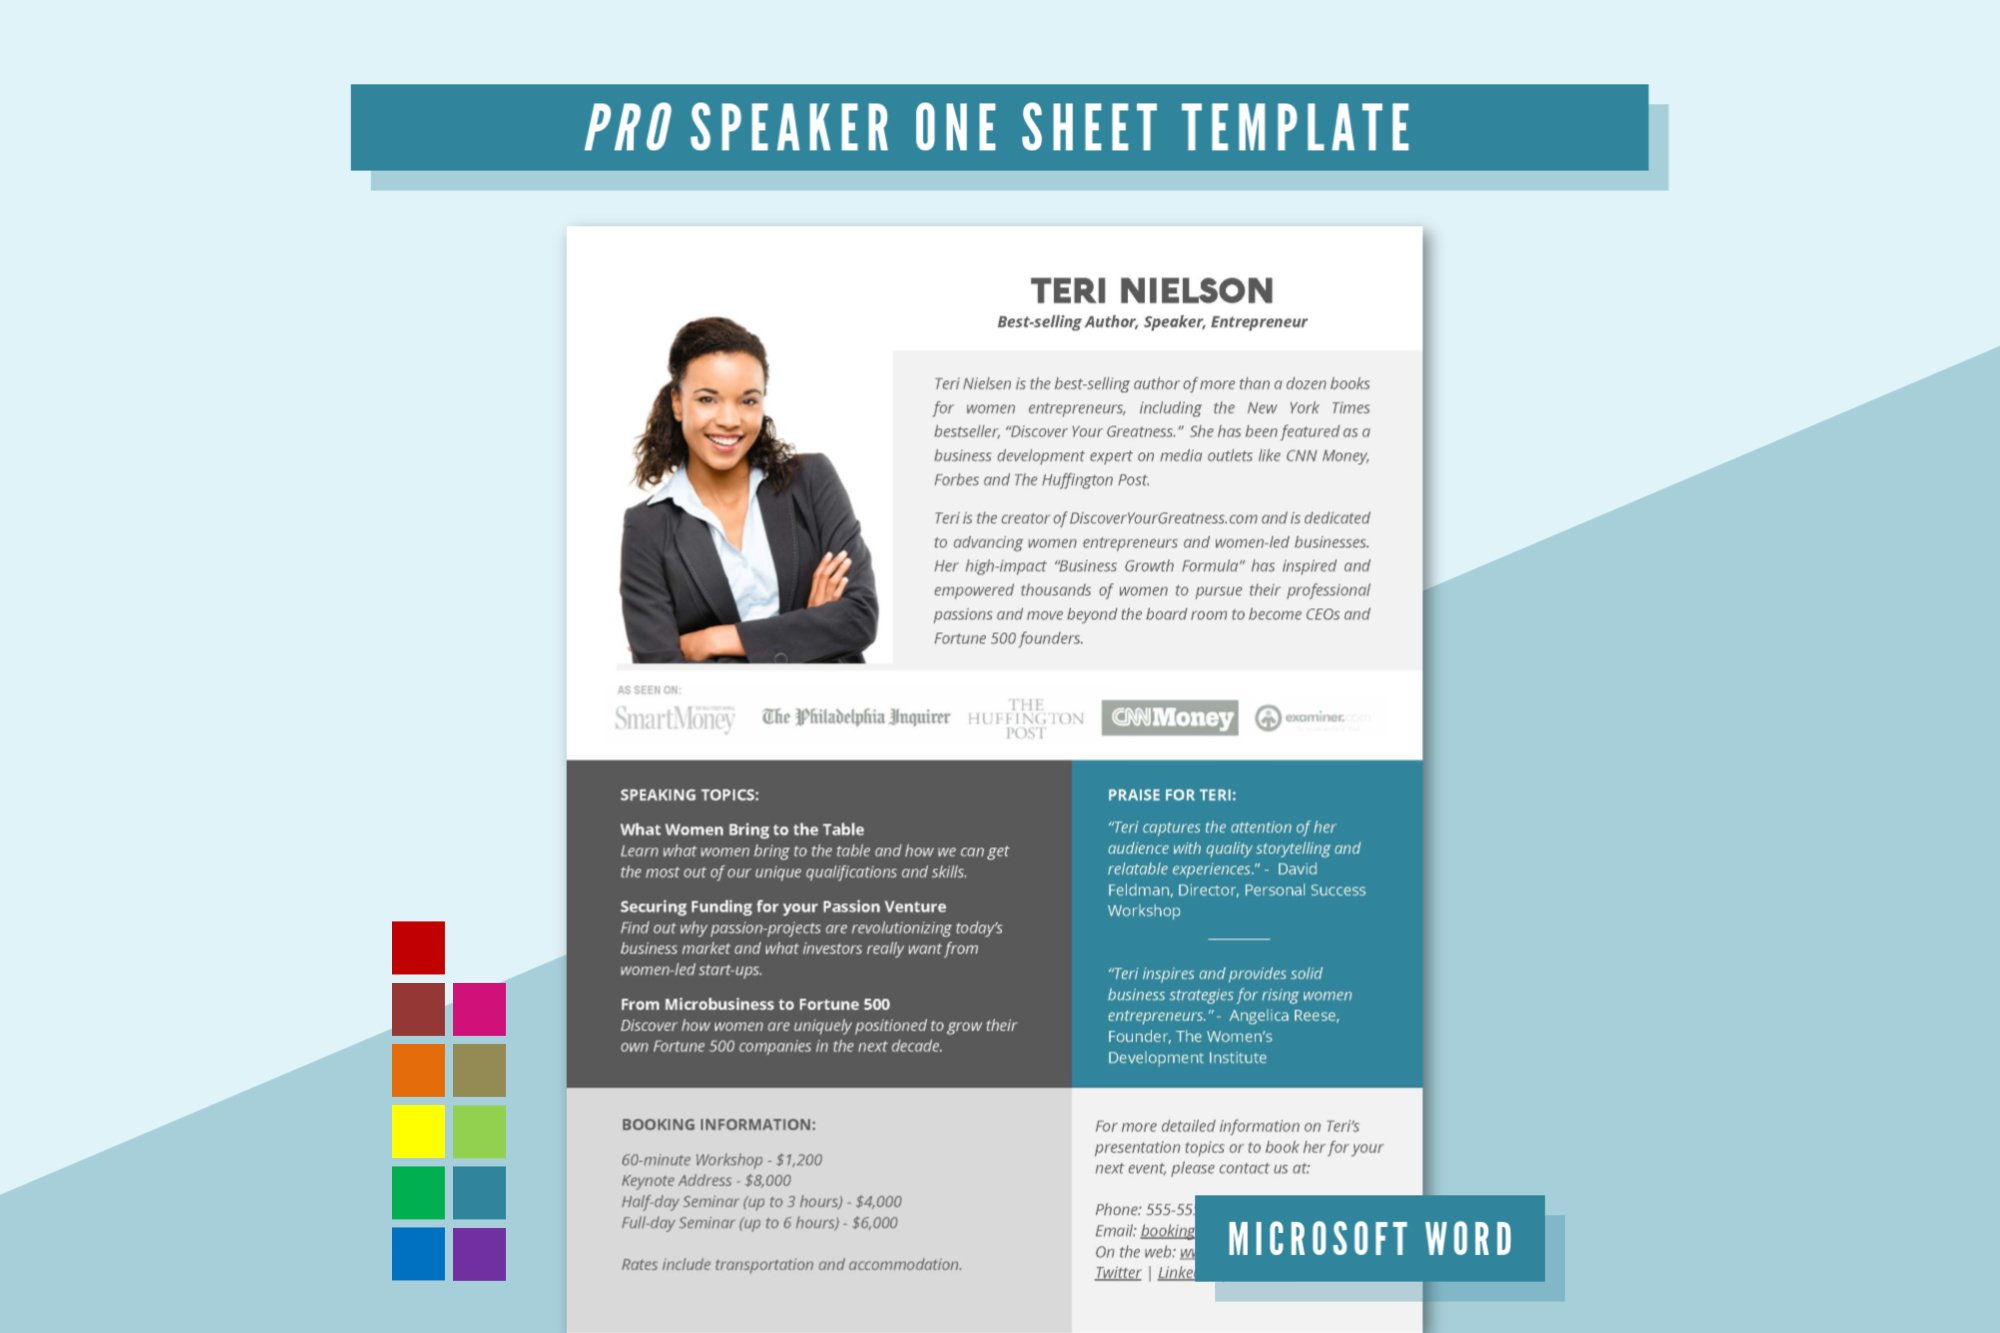 PRO Speaker One Sheet Template .DOCX